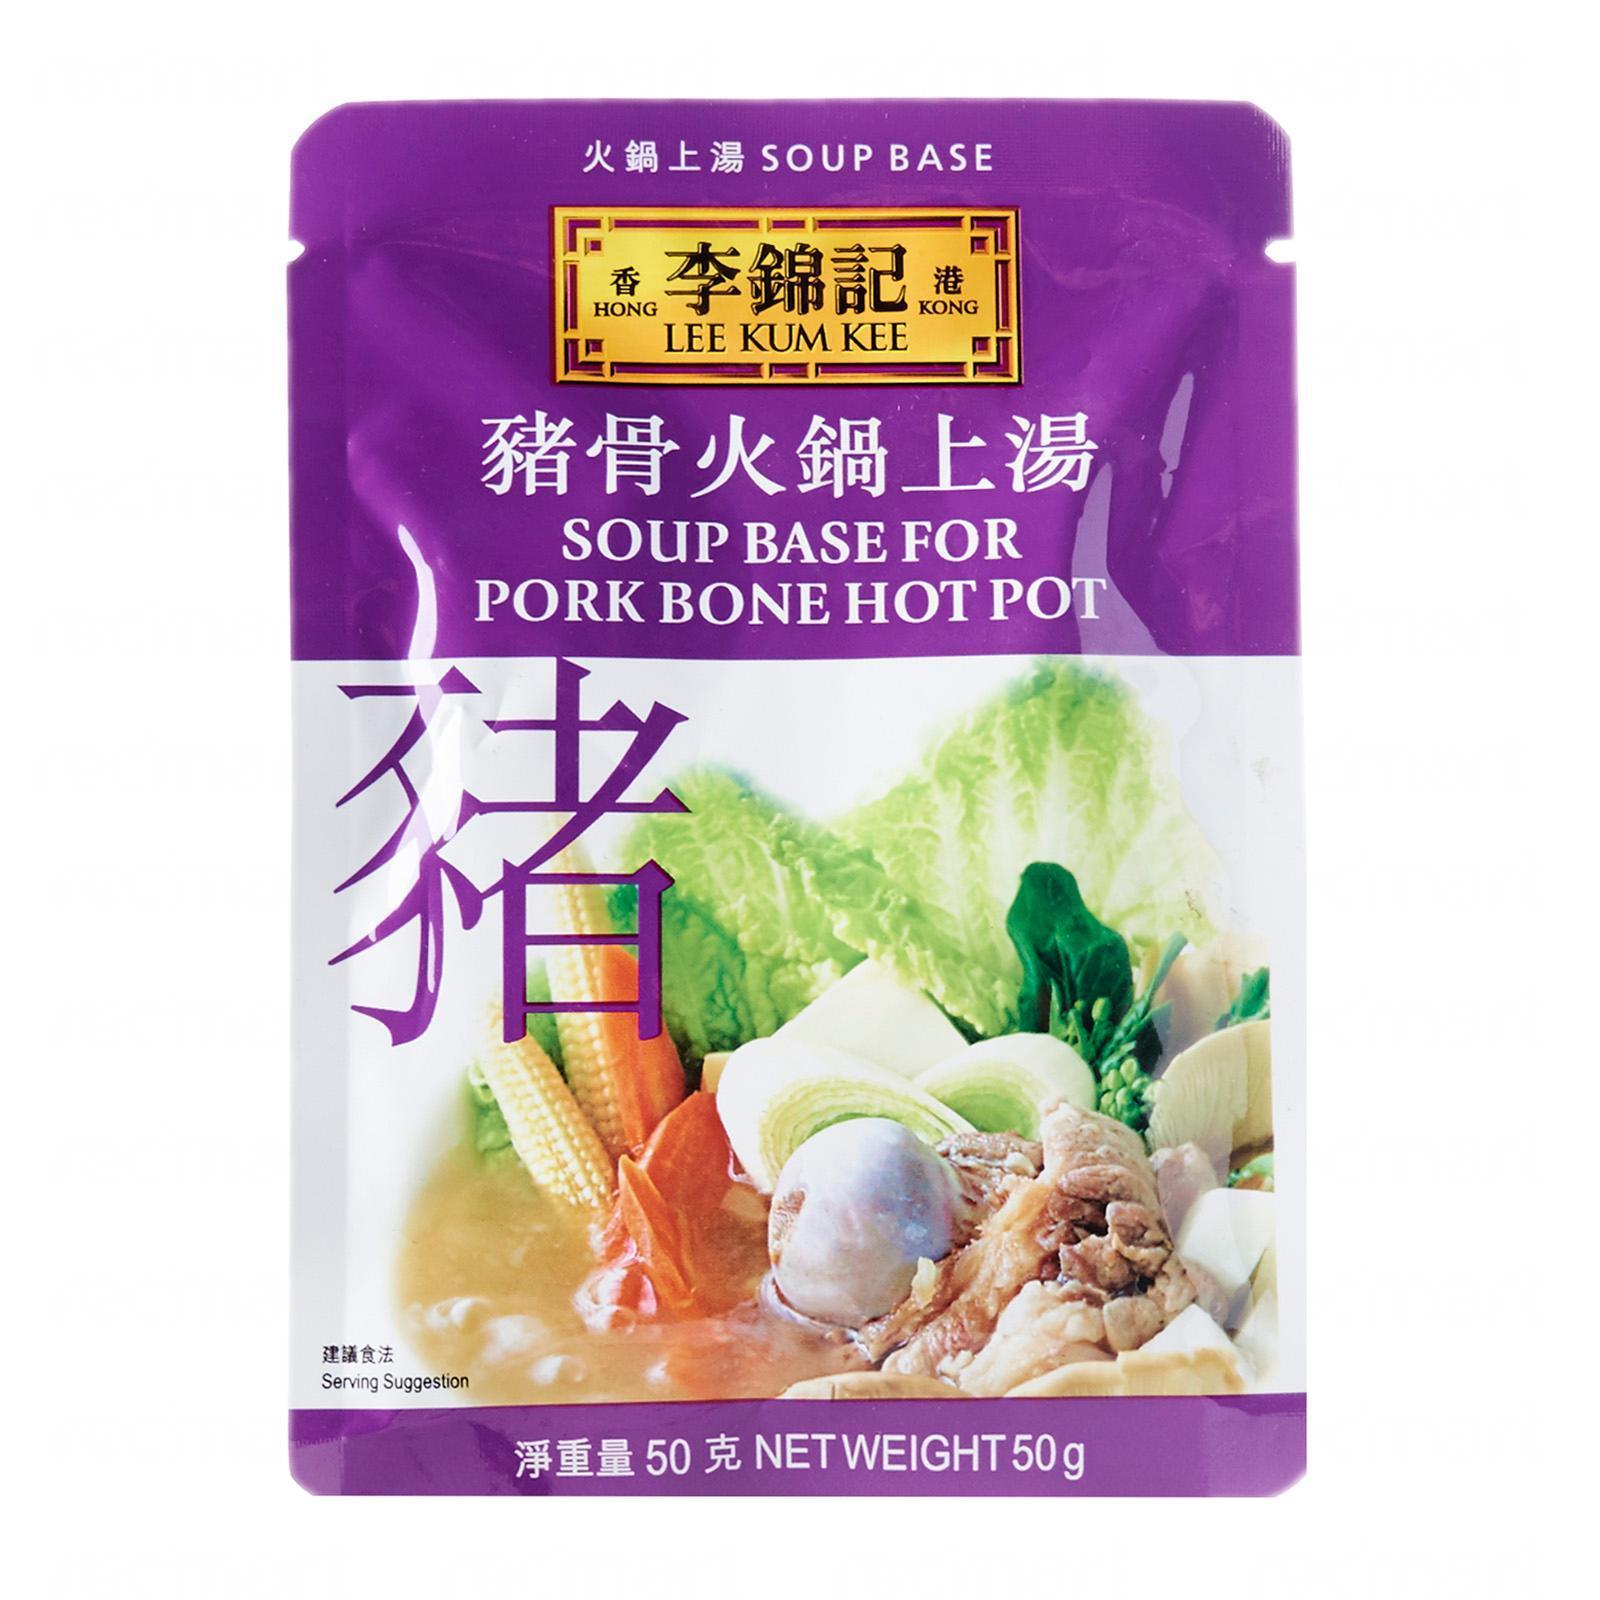 Lee Kum Kee Mos Pork Bone Soup Base For Hotpot Soup